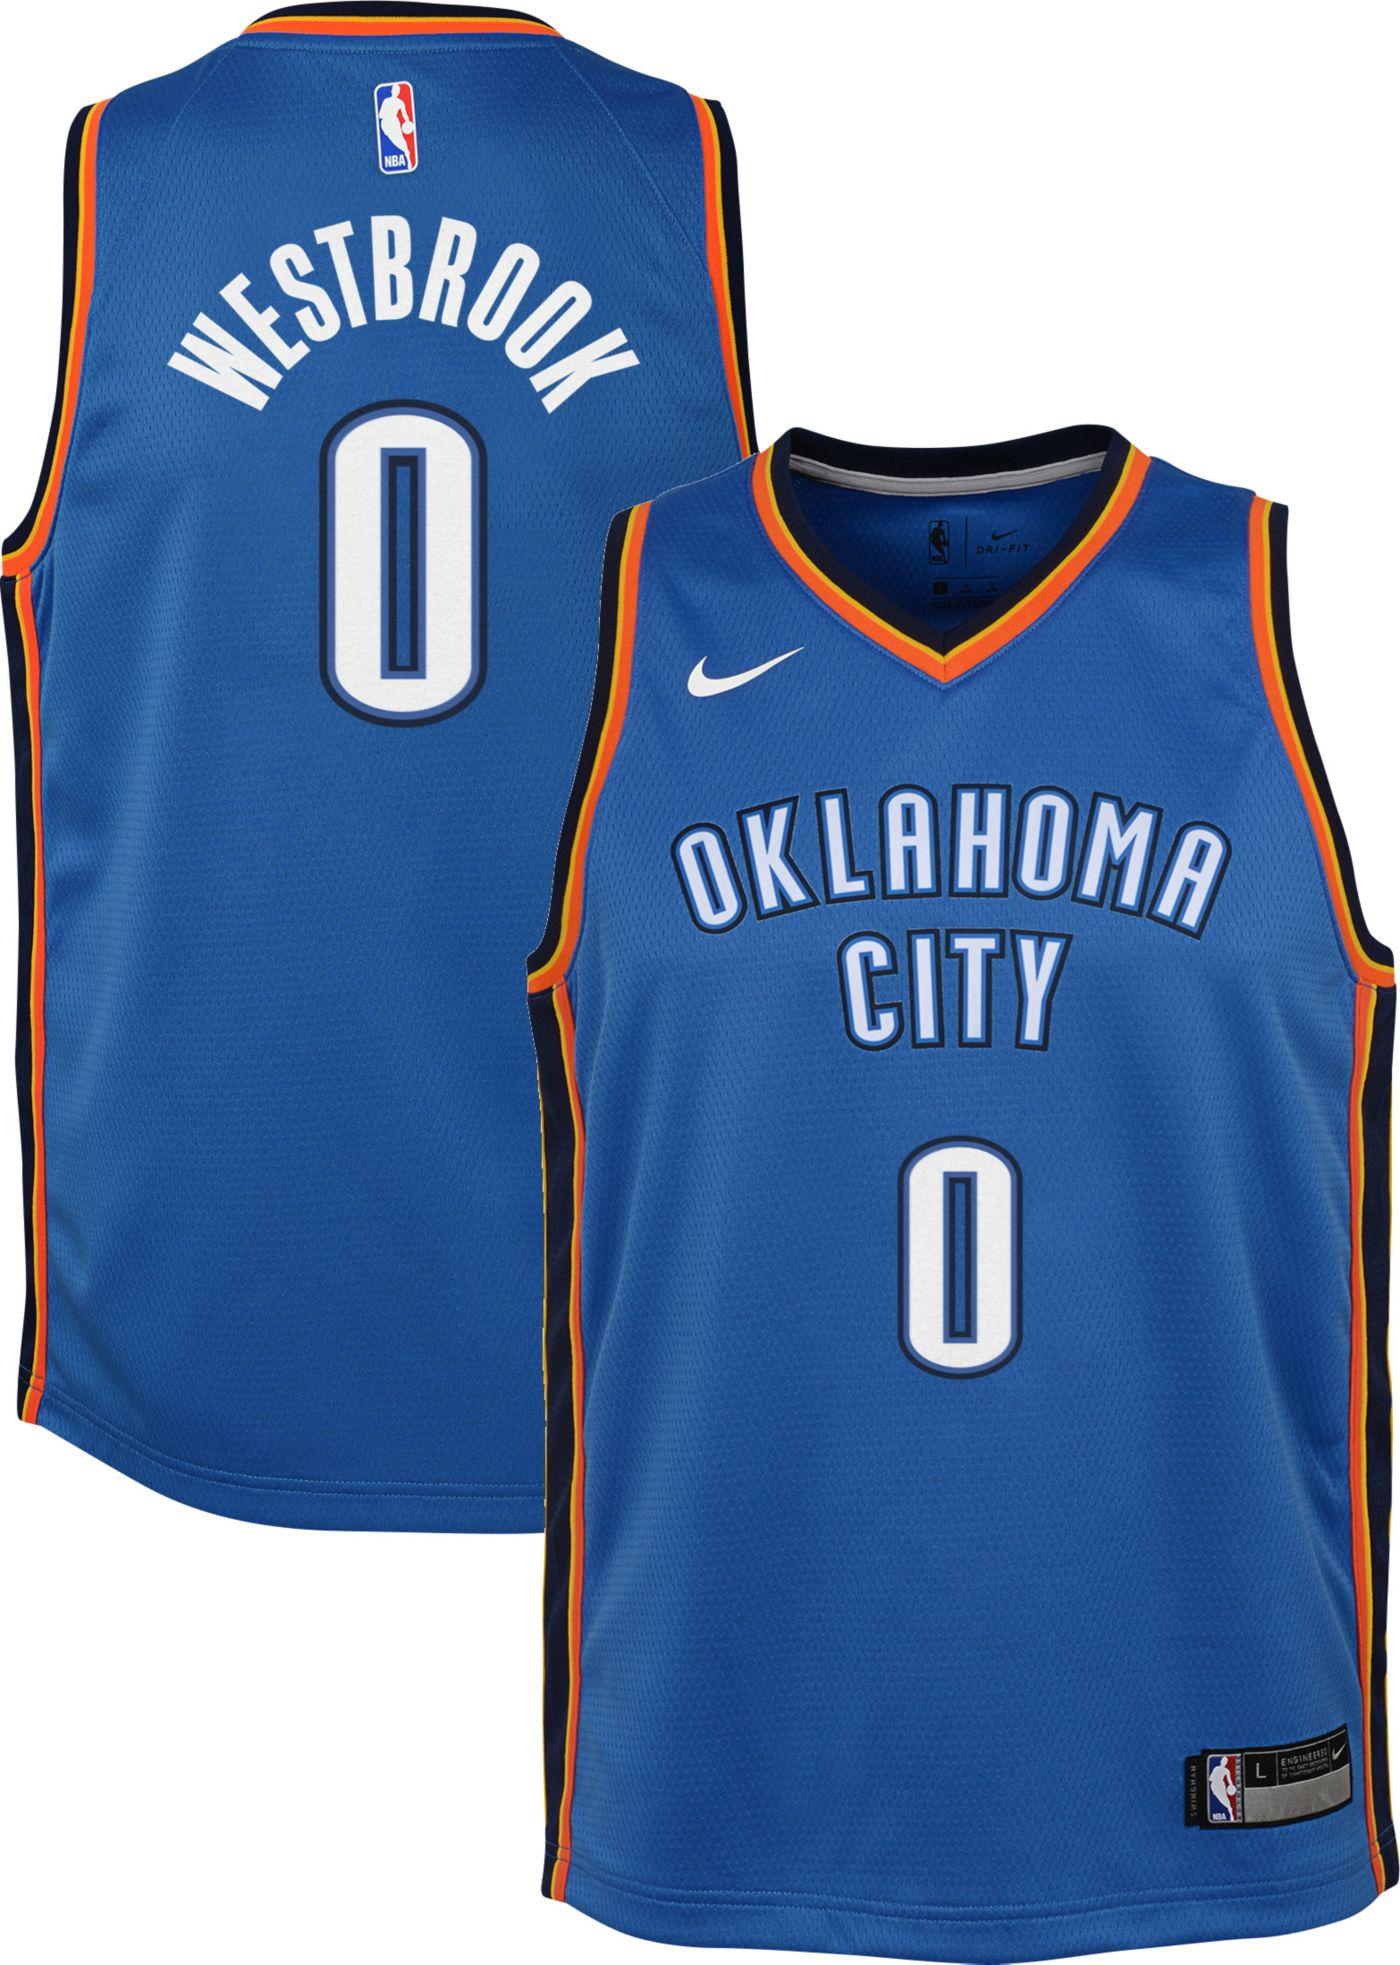 Nike Youth Oklahoma City Thunder Russell Westbrook #0 Blue Dri-FIT Swingman Jersey